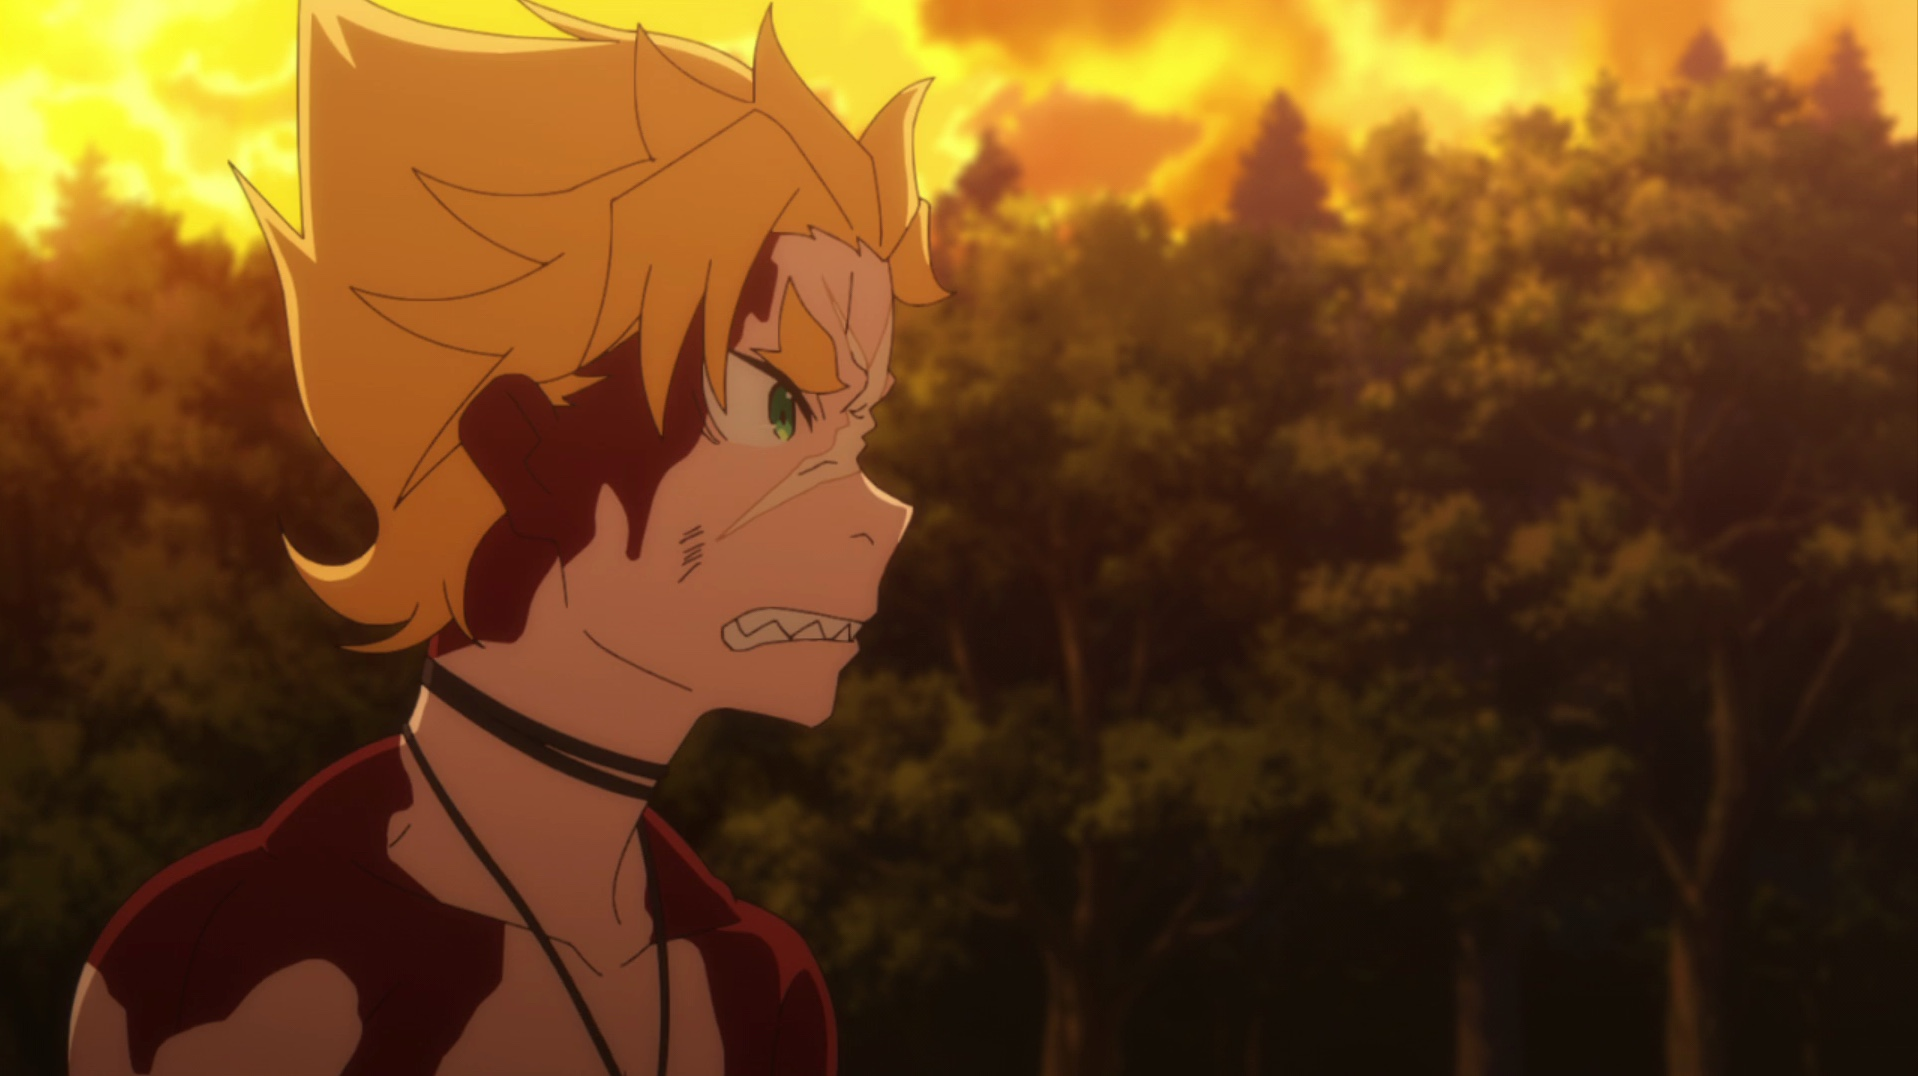 Re:ZERO Season 2 Part 2 Episode 41 - Young Garfiel and Simply Emilia |  Crow's World of Anime